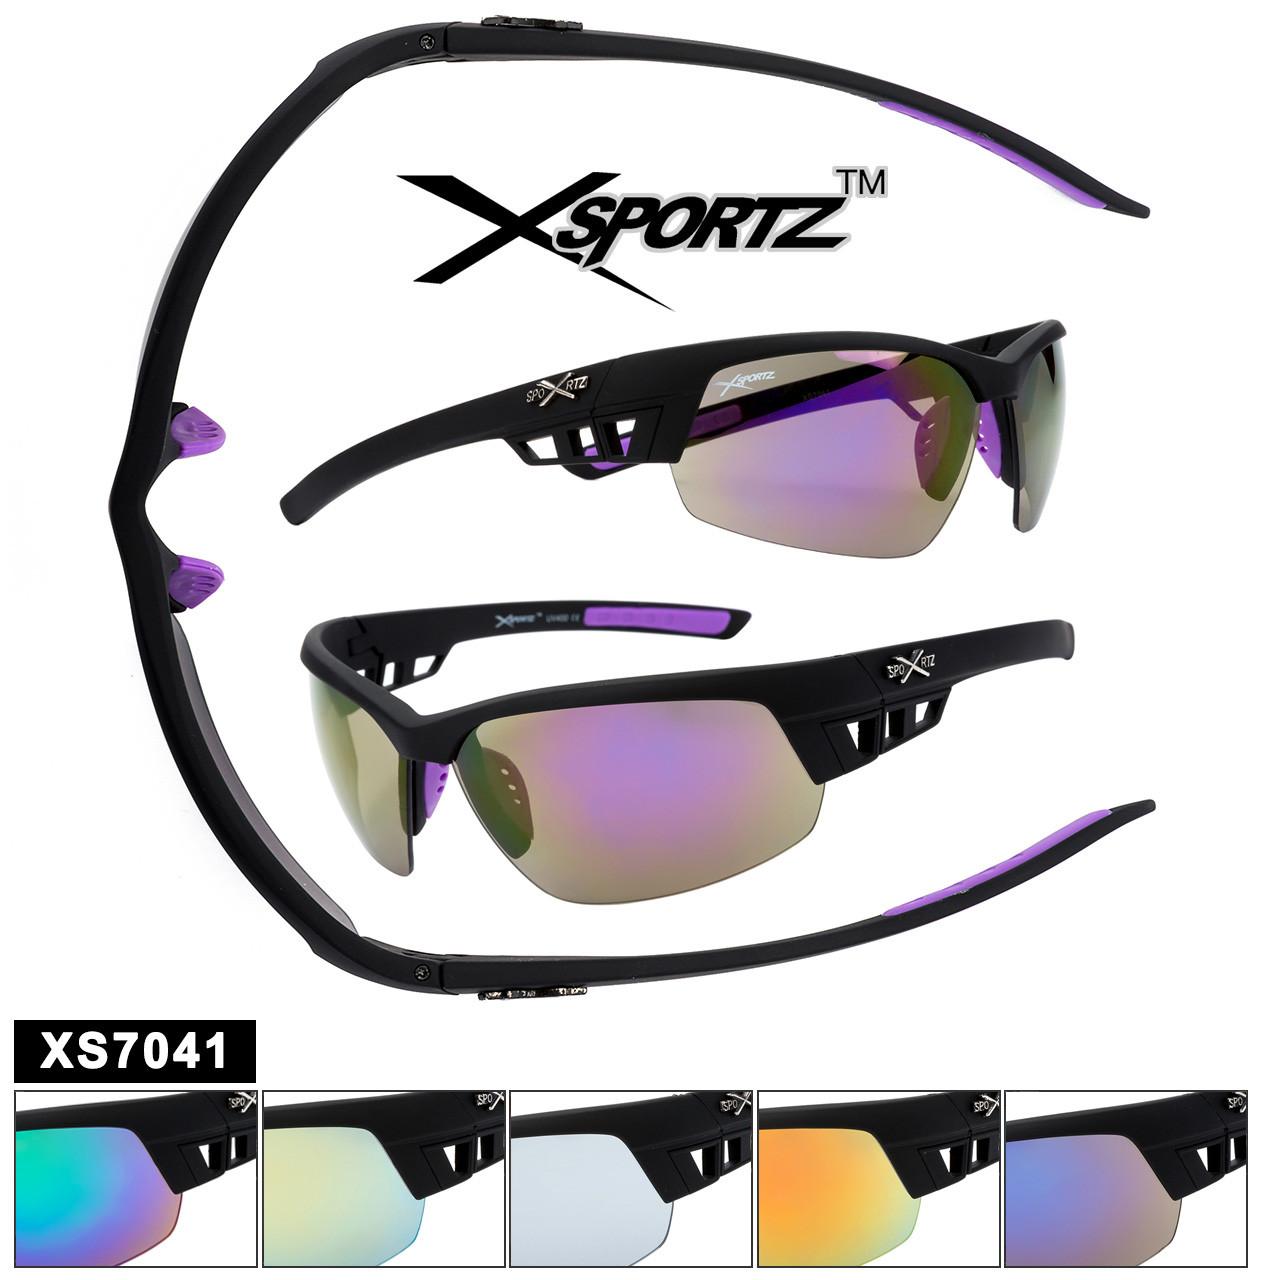 Sports Sunglasses by the Dozen - Style XS7041